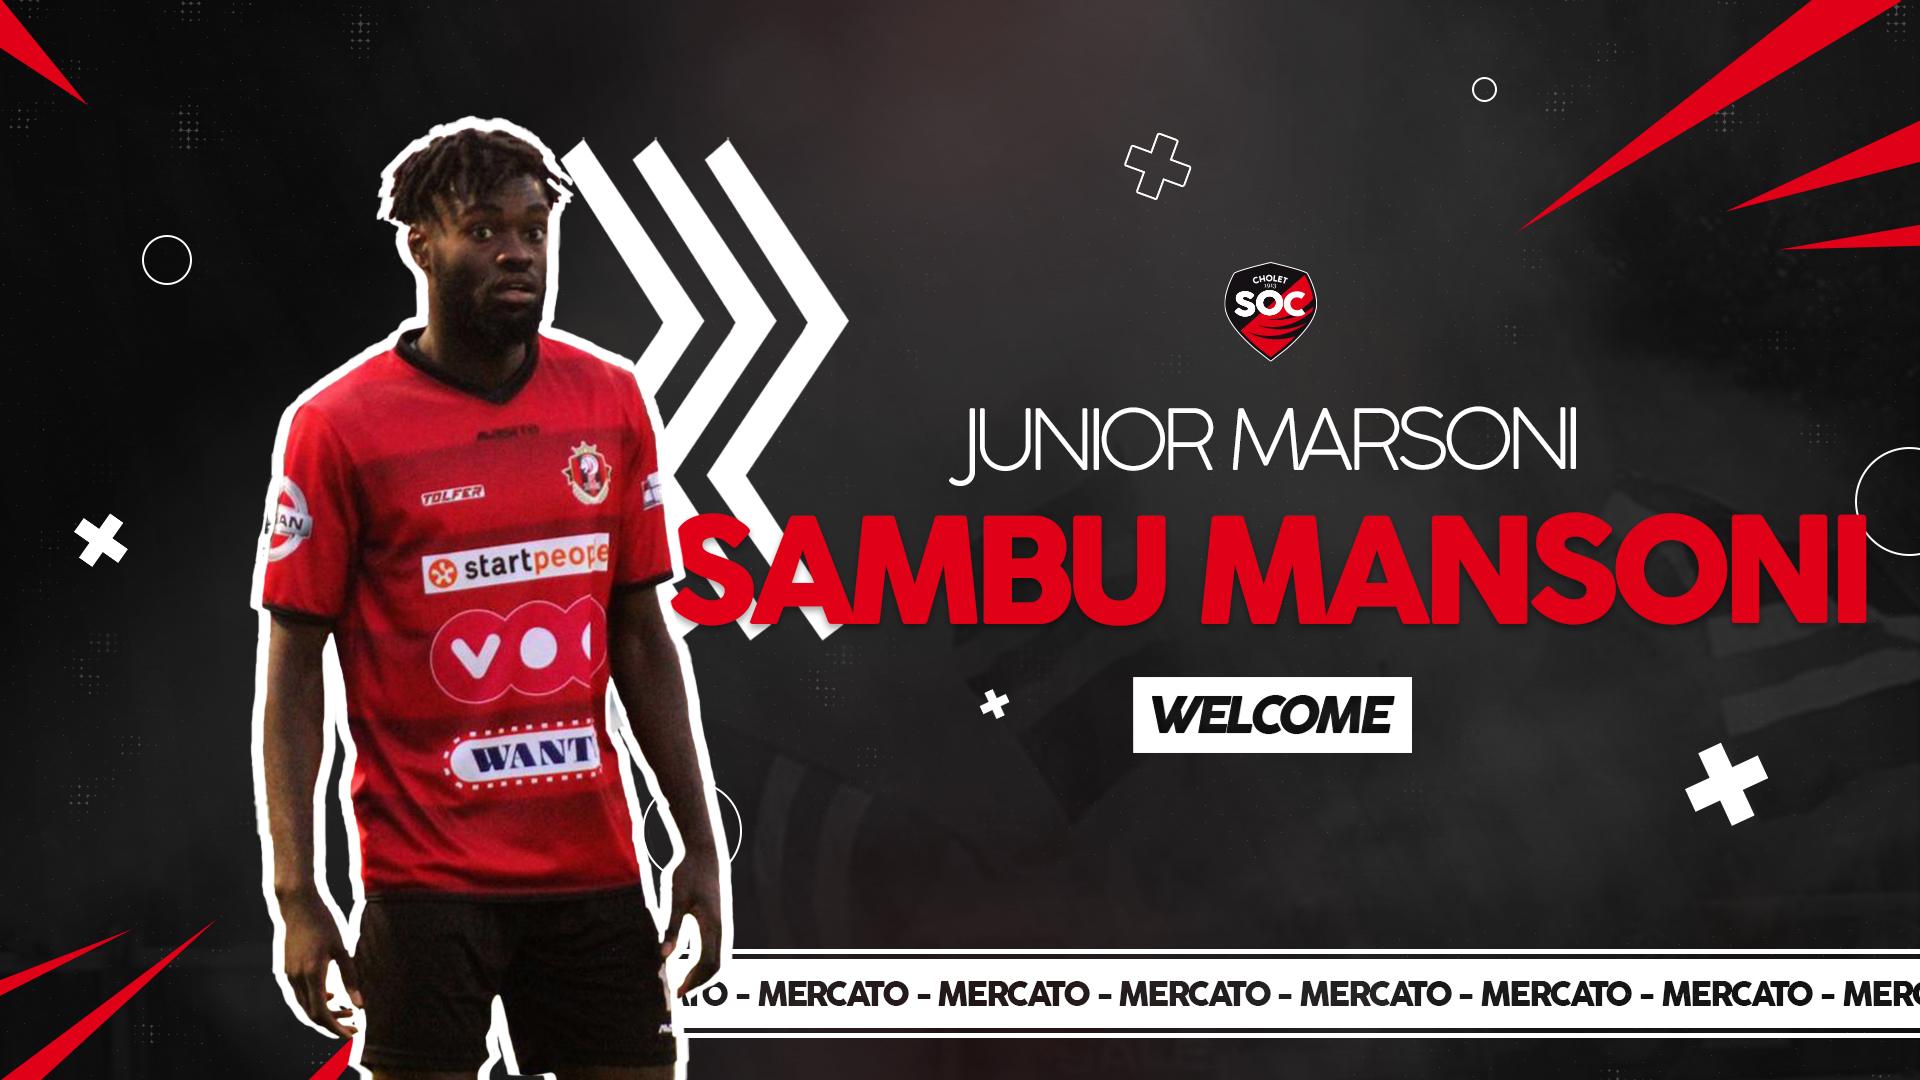 Junior Marsoni Sambu Mansoni Recrue